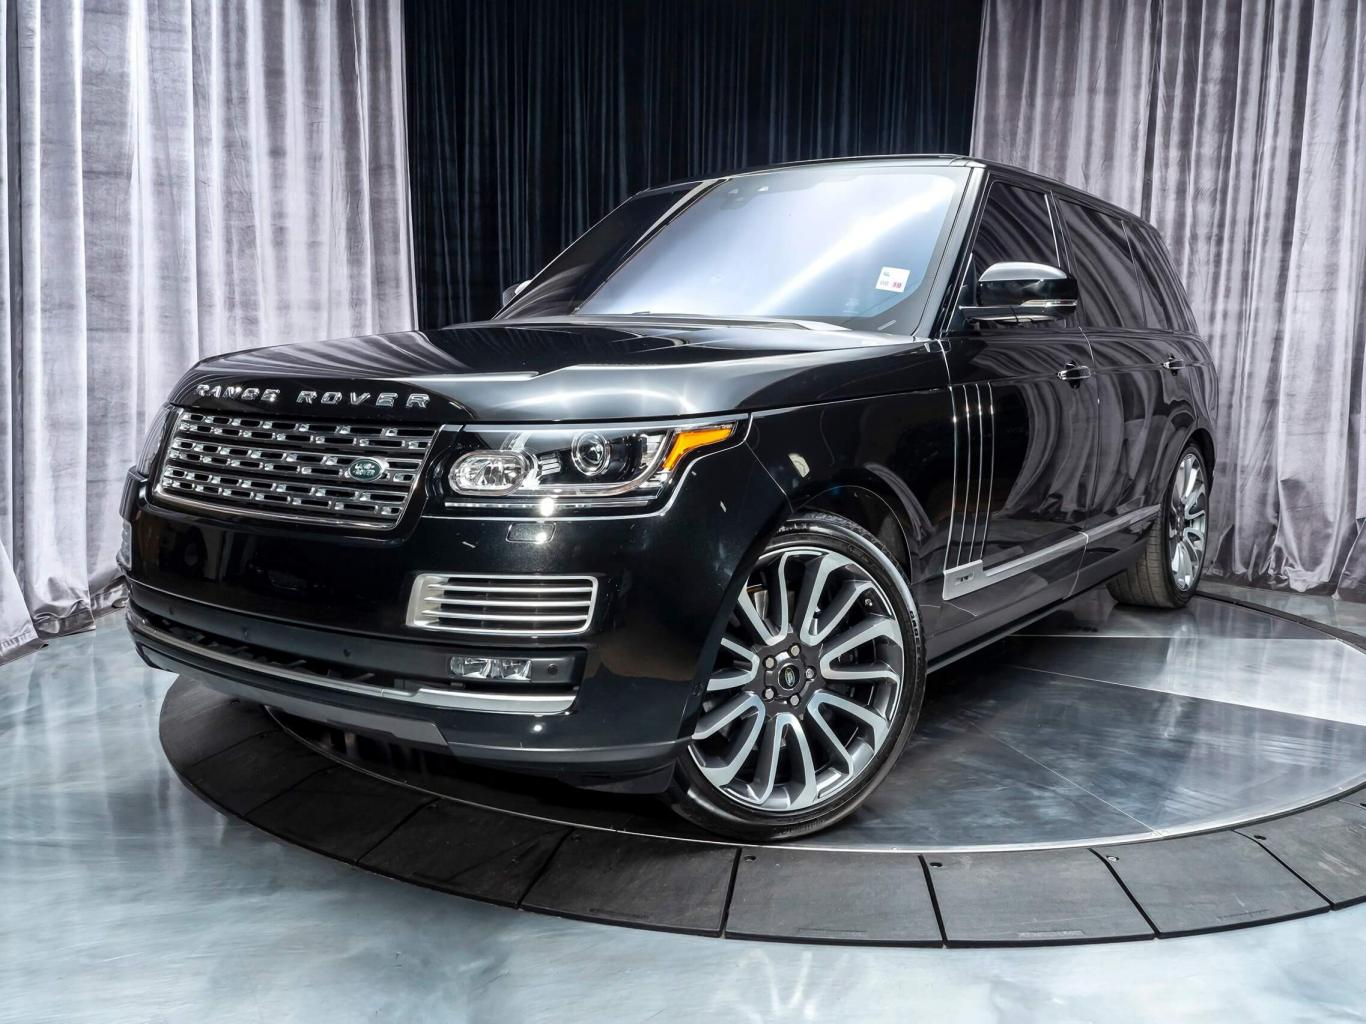 Range Rover Autobiography Price >> Land Rover Range Rover Sv Autobiography Lwb Suv Msrp 205k